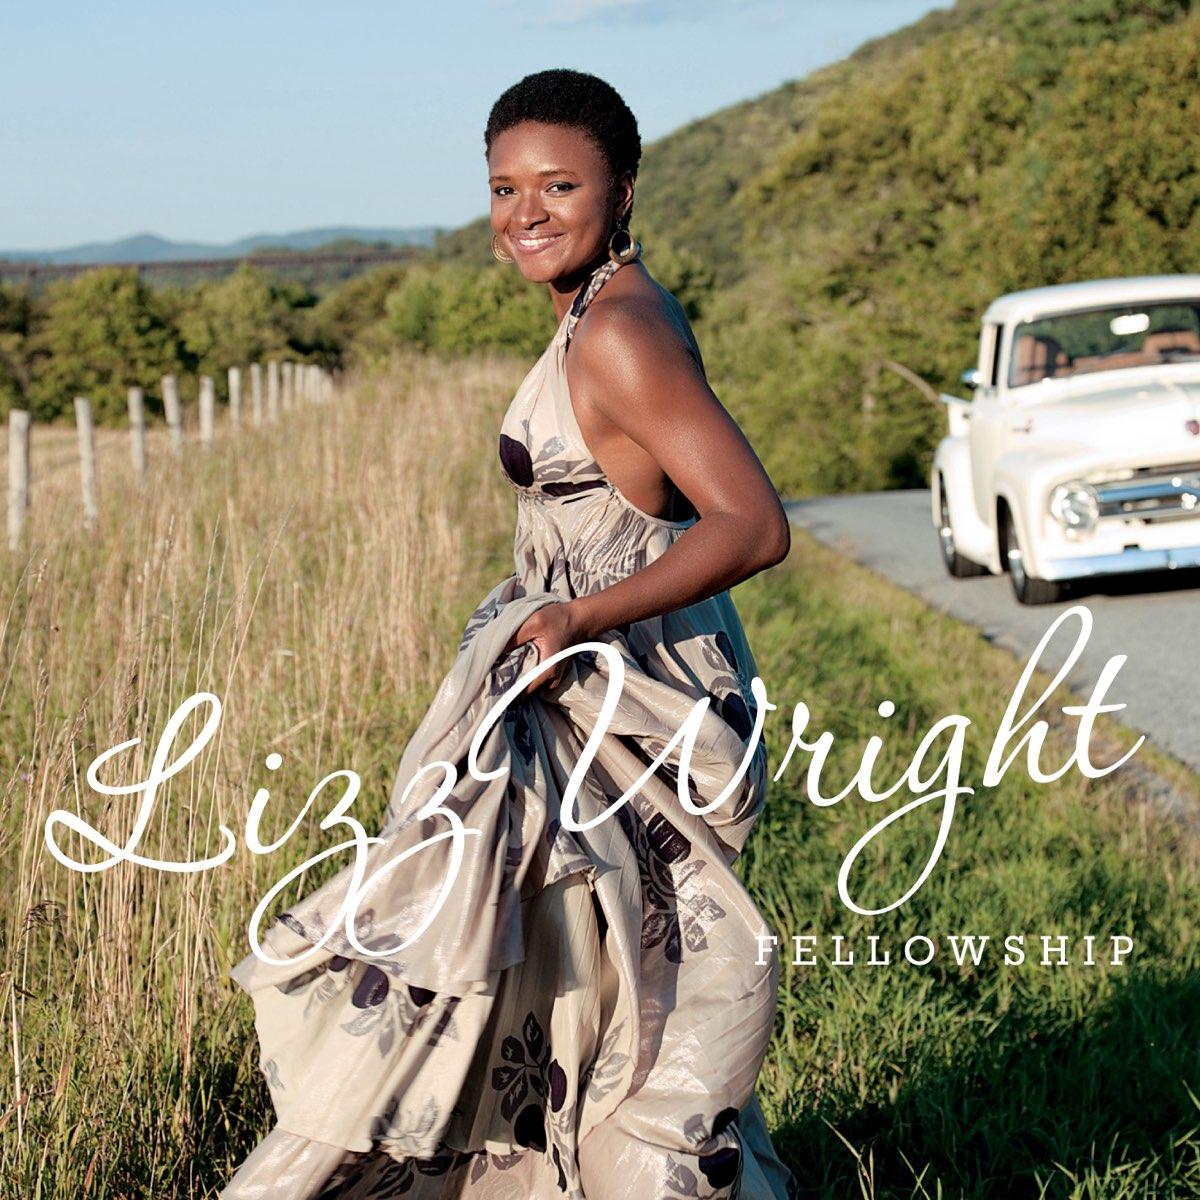 Lizz Wright, Fellowship